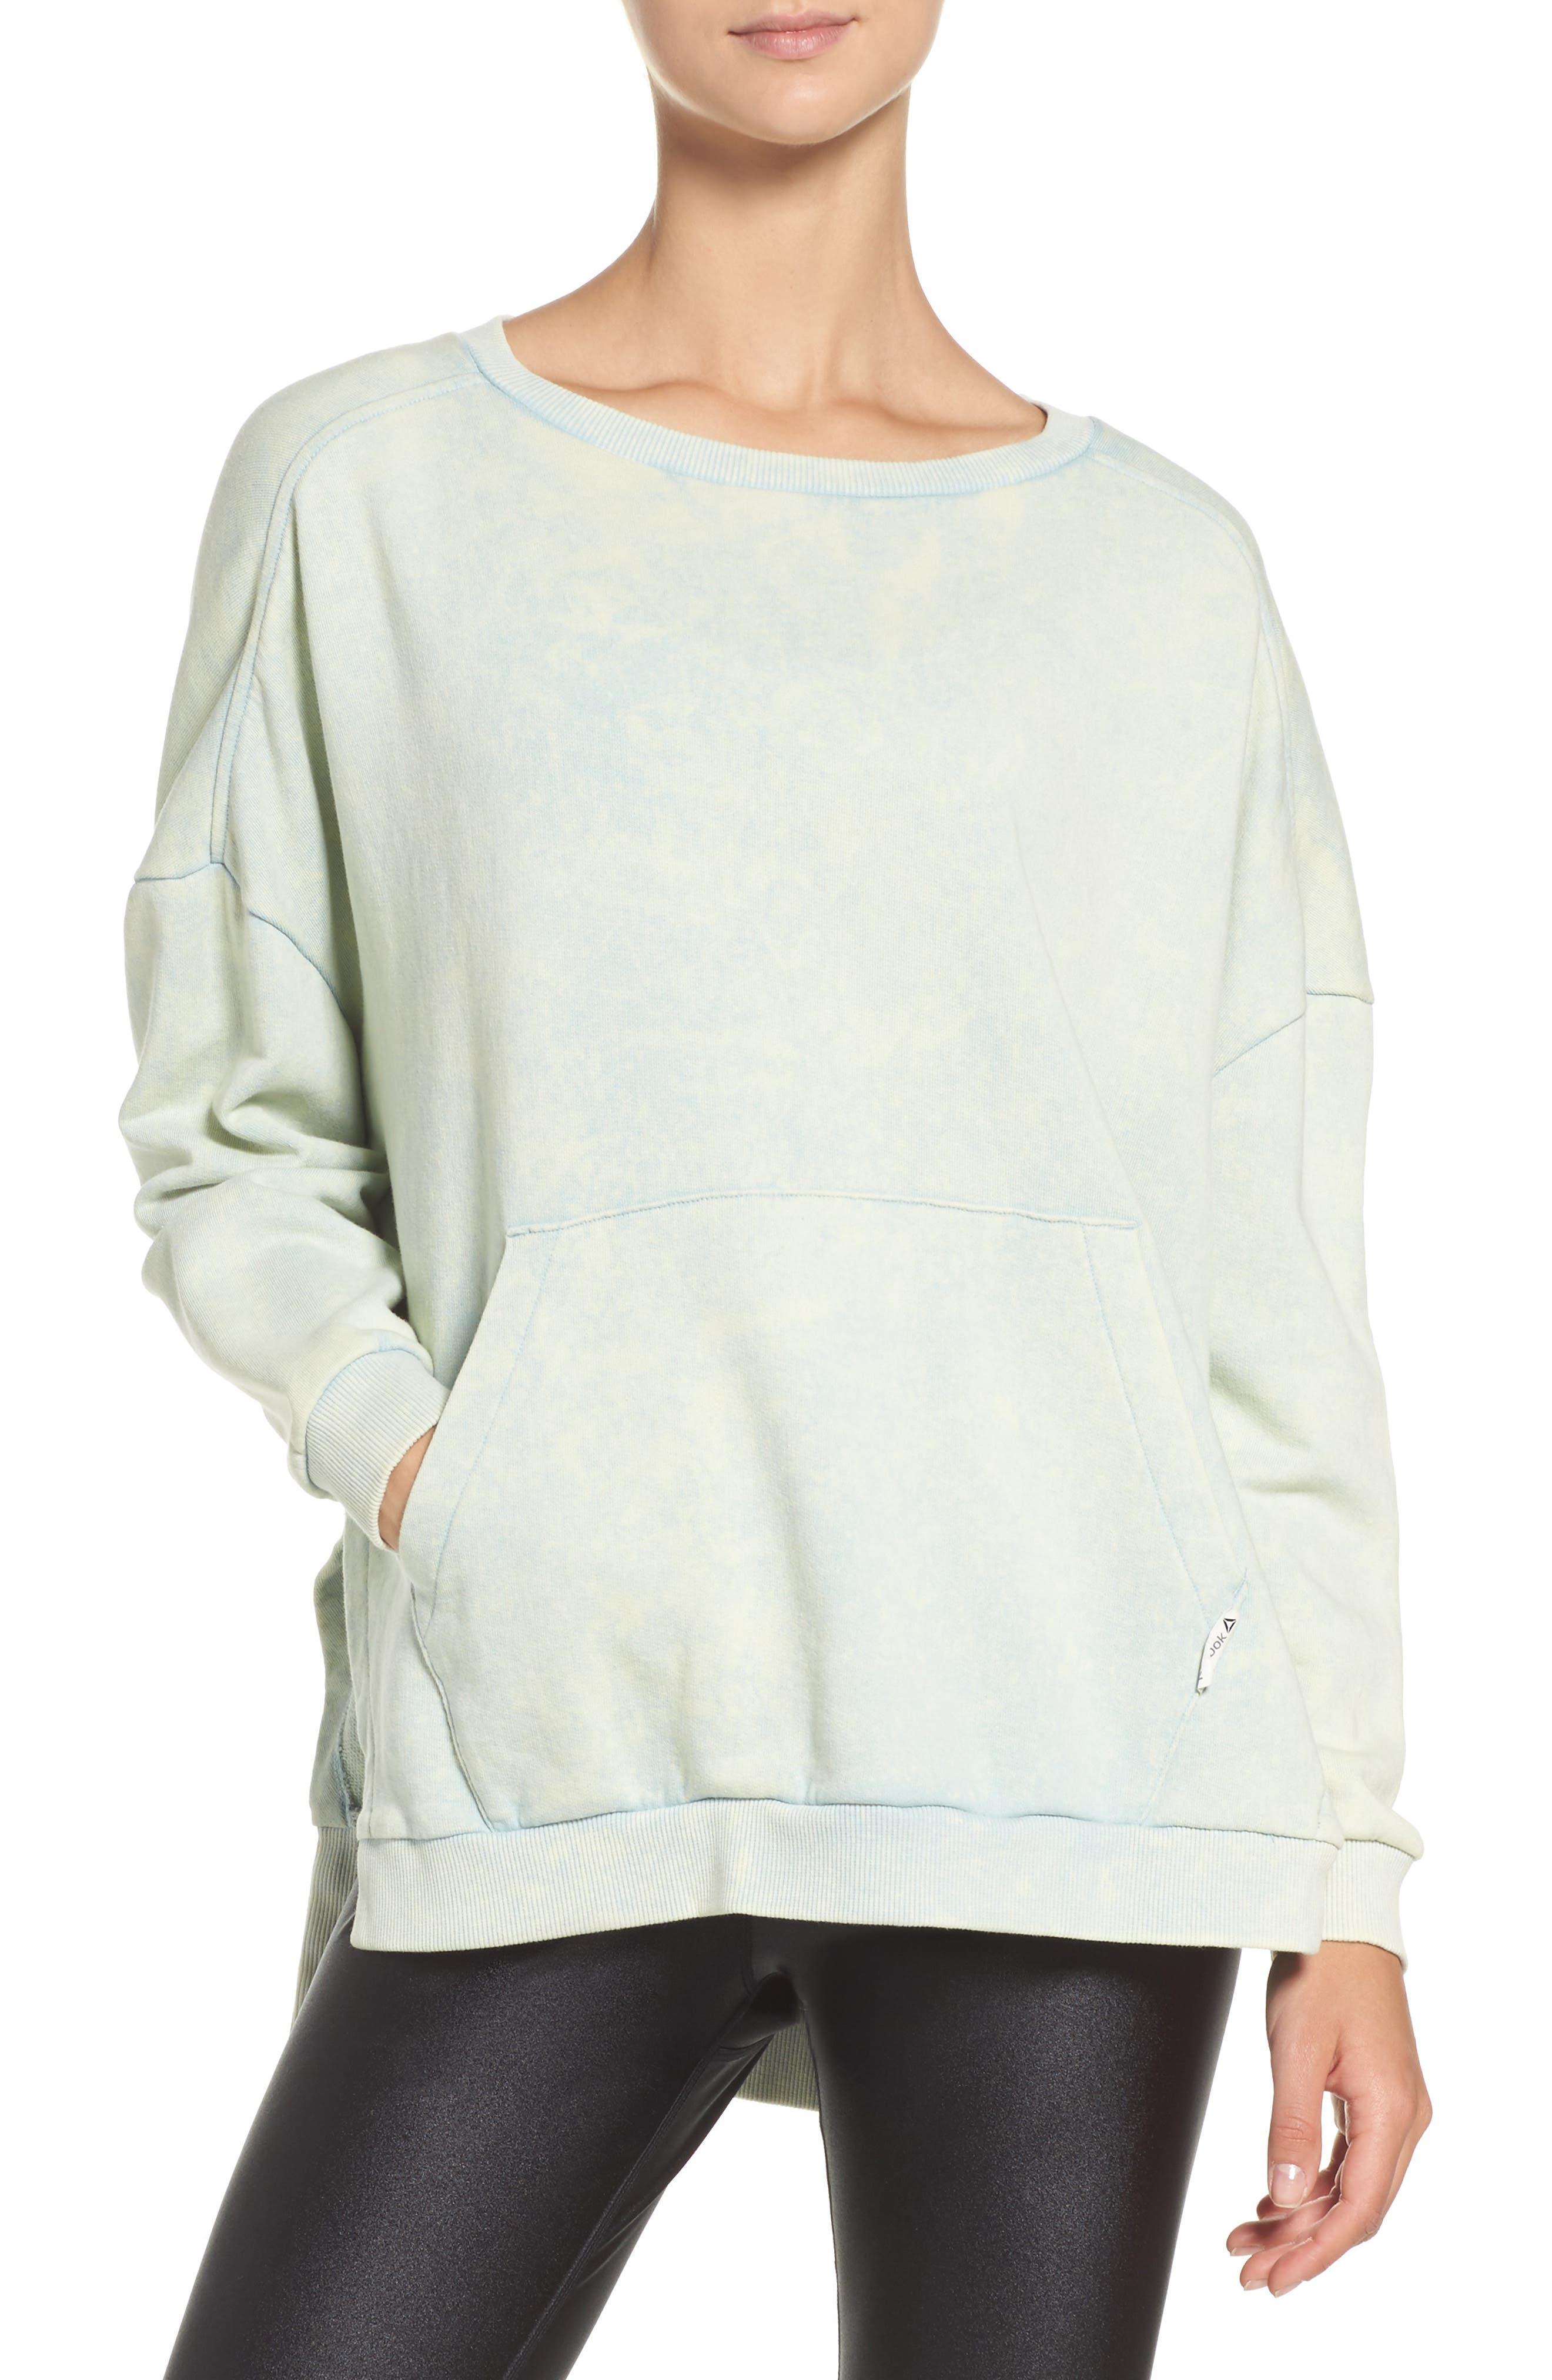 Alternate Image 1 Selected - Reebok Favorite Oversized Sweatshirt